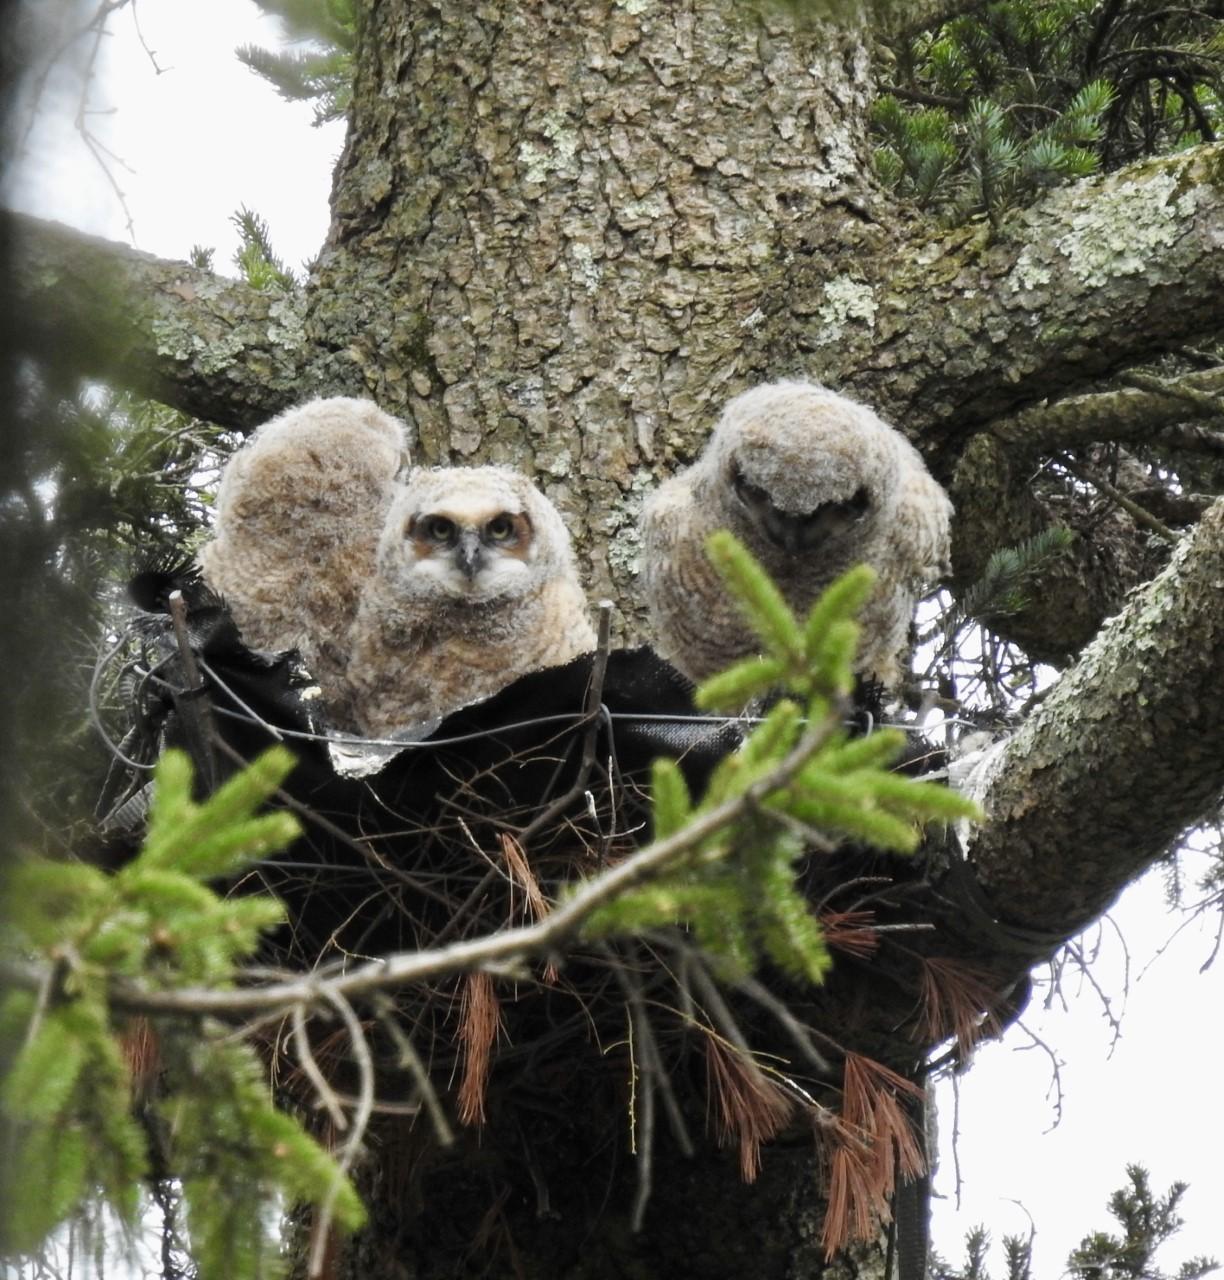 Five week old owlets